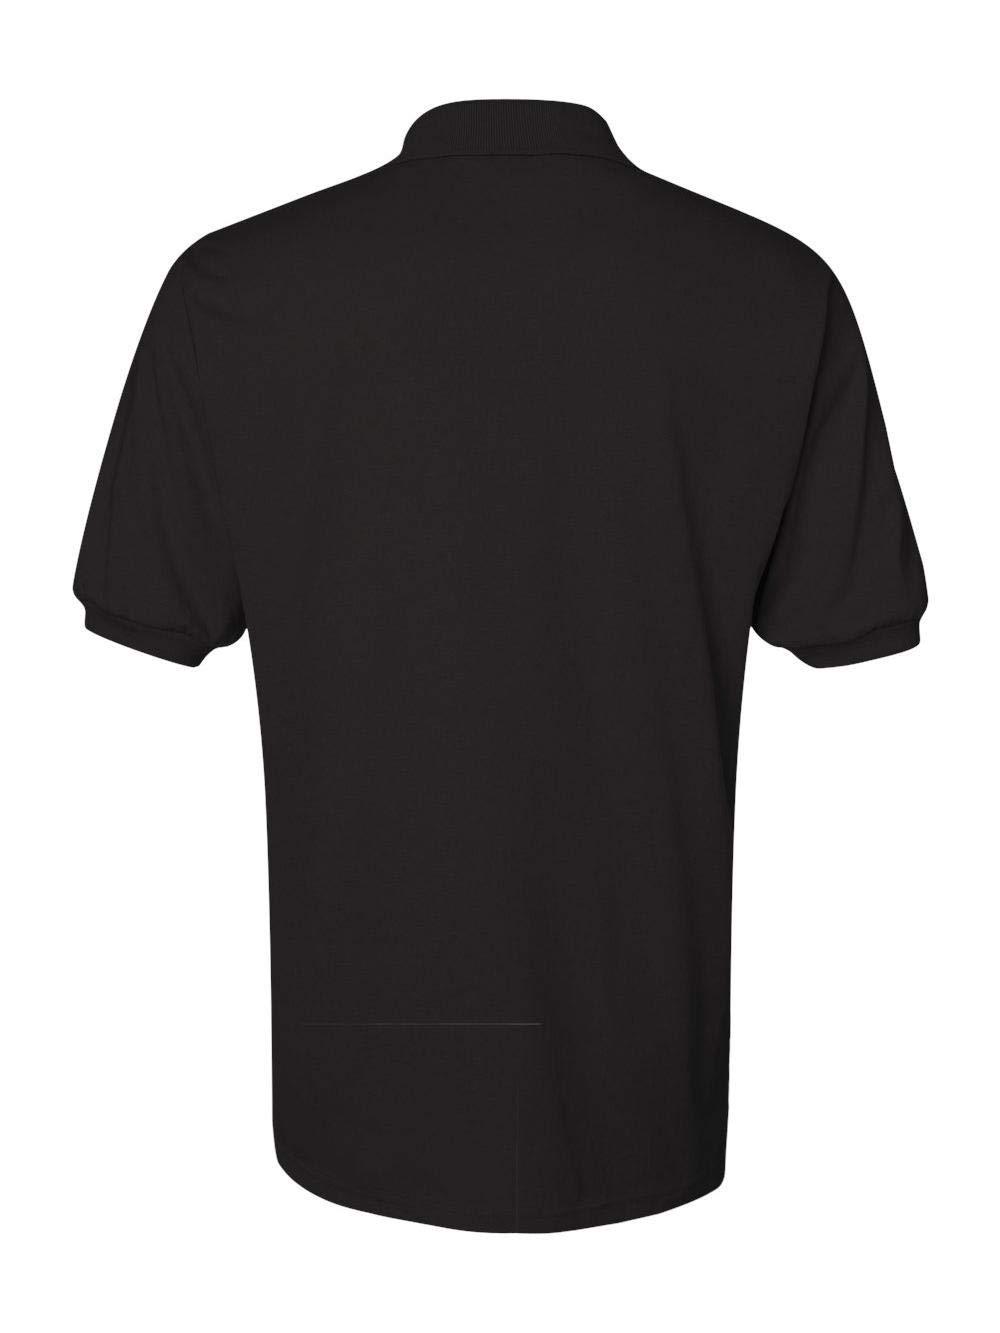 Jerzees Men's Spot Shield Short Sleeve Polo Sport Shirt, Black X-Large by Jerzees (Image #4)